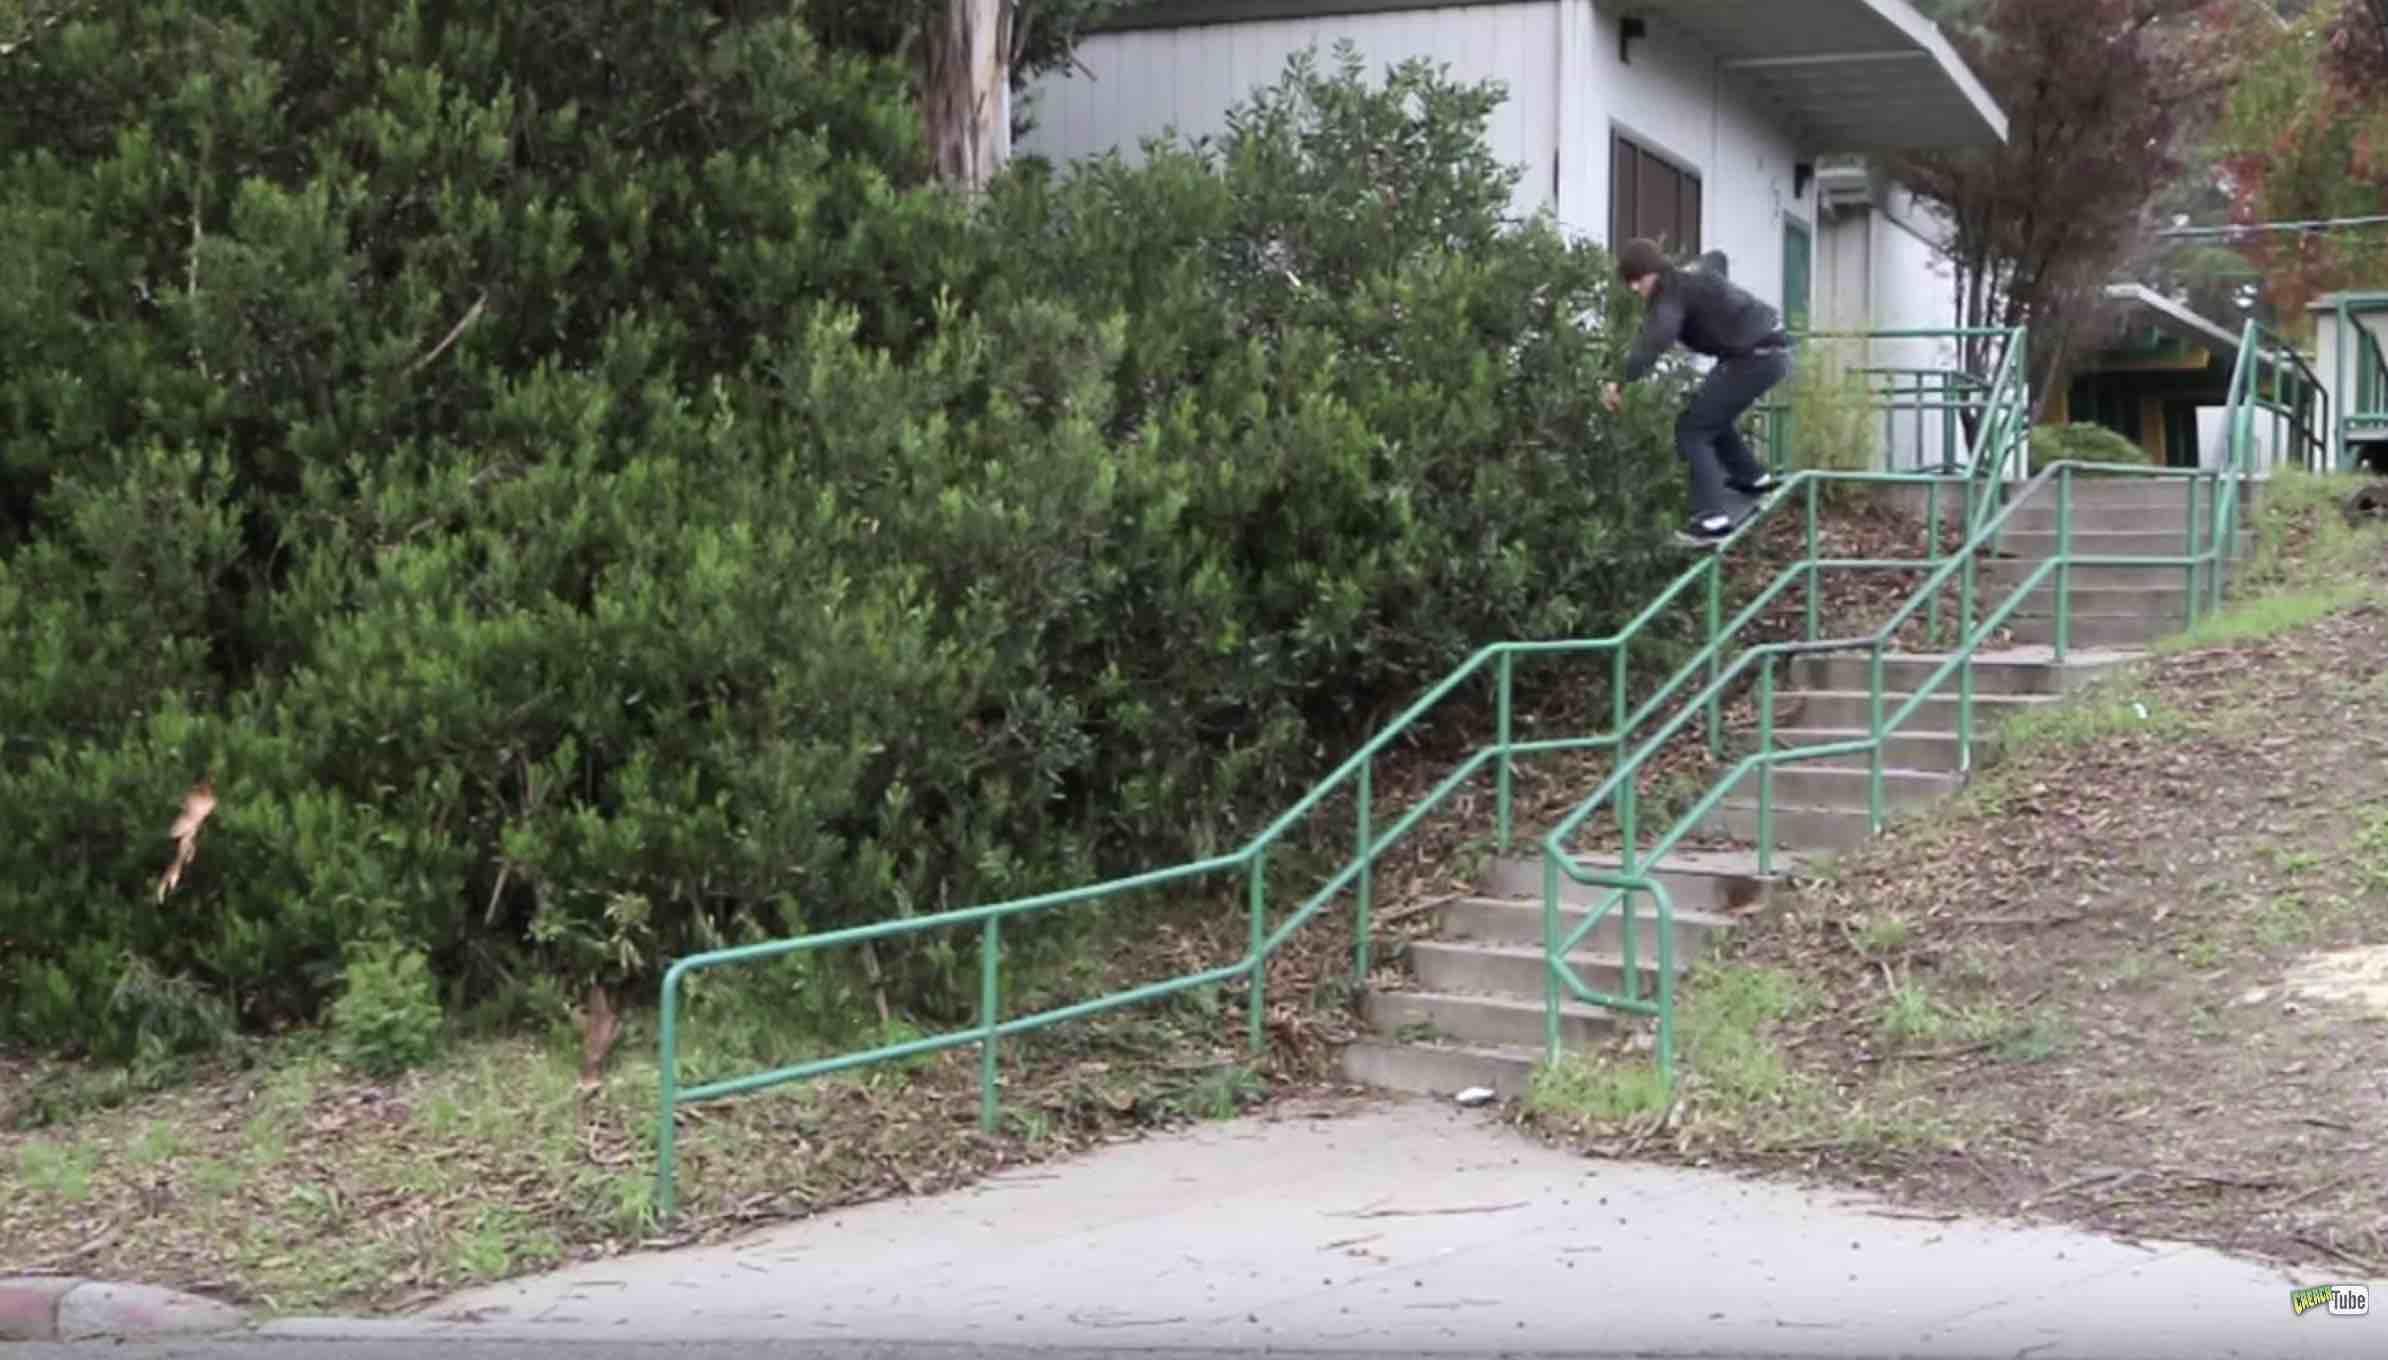 kevin baekkel, creature skateboards